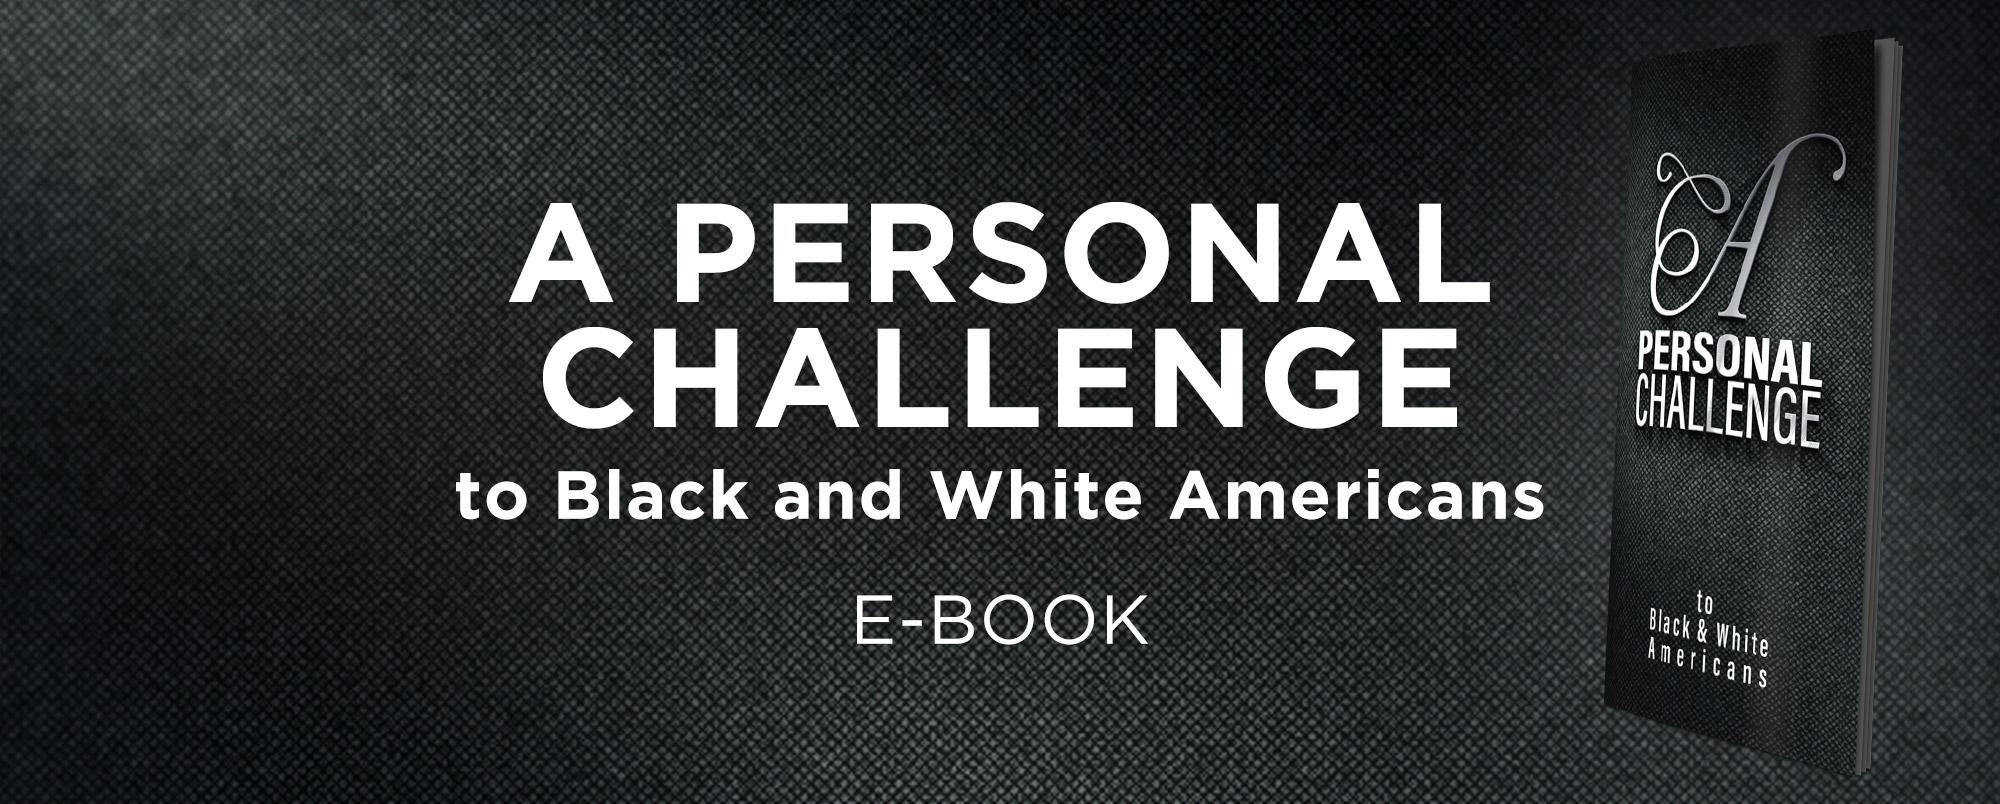 eBookHeader-challenge